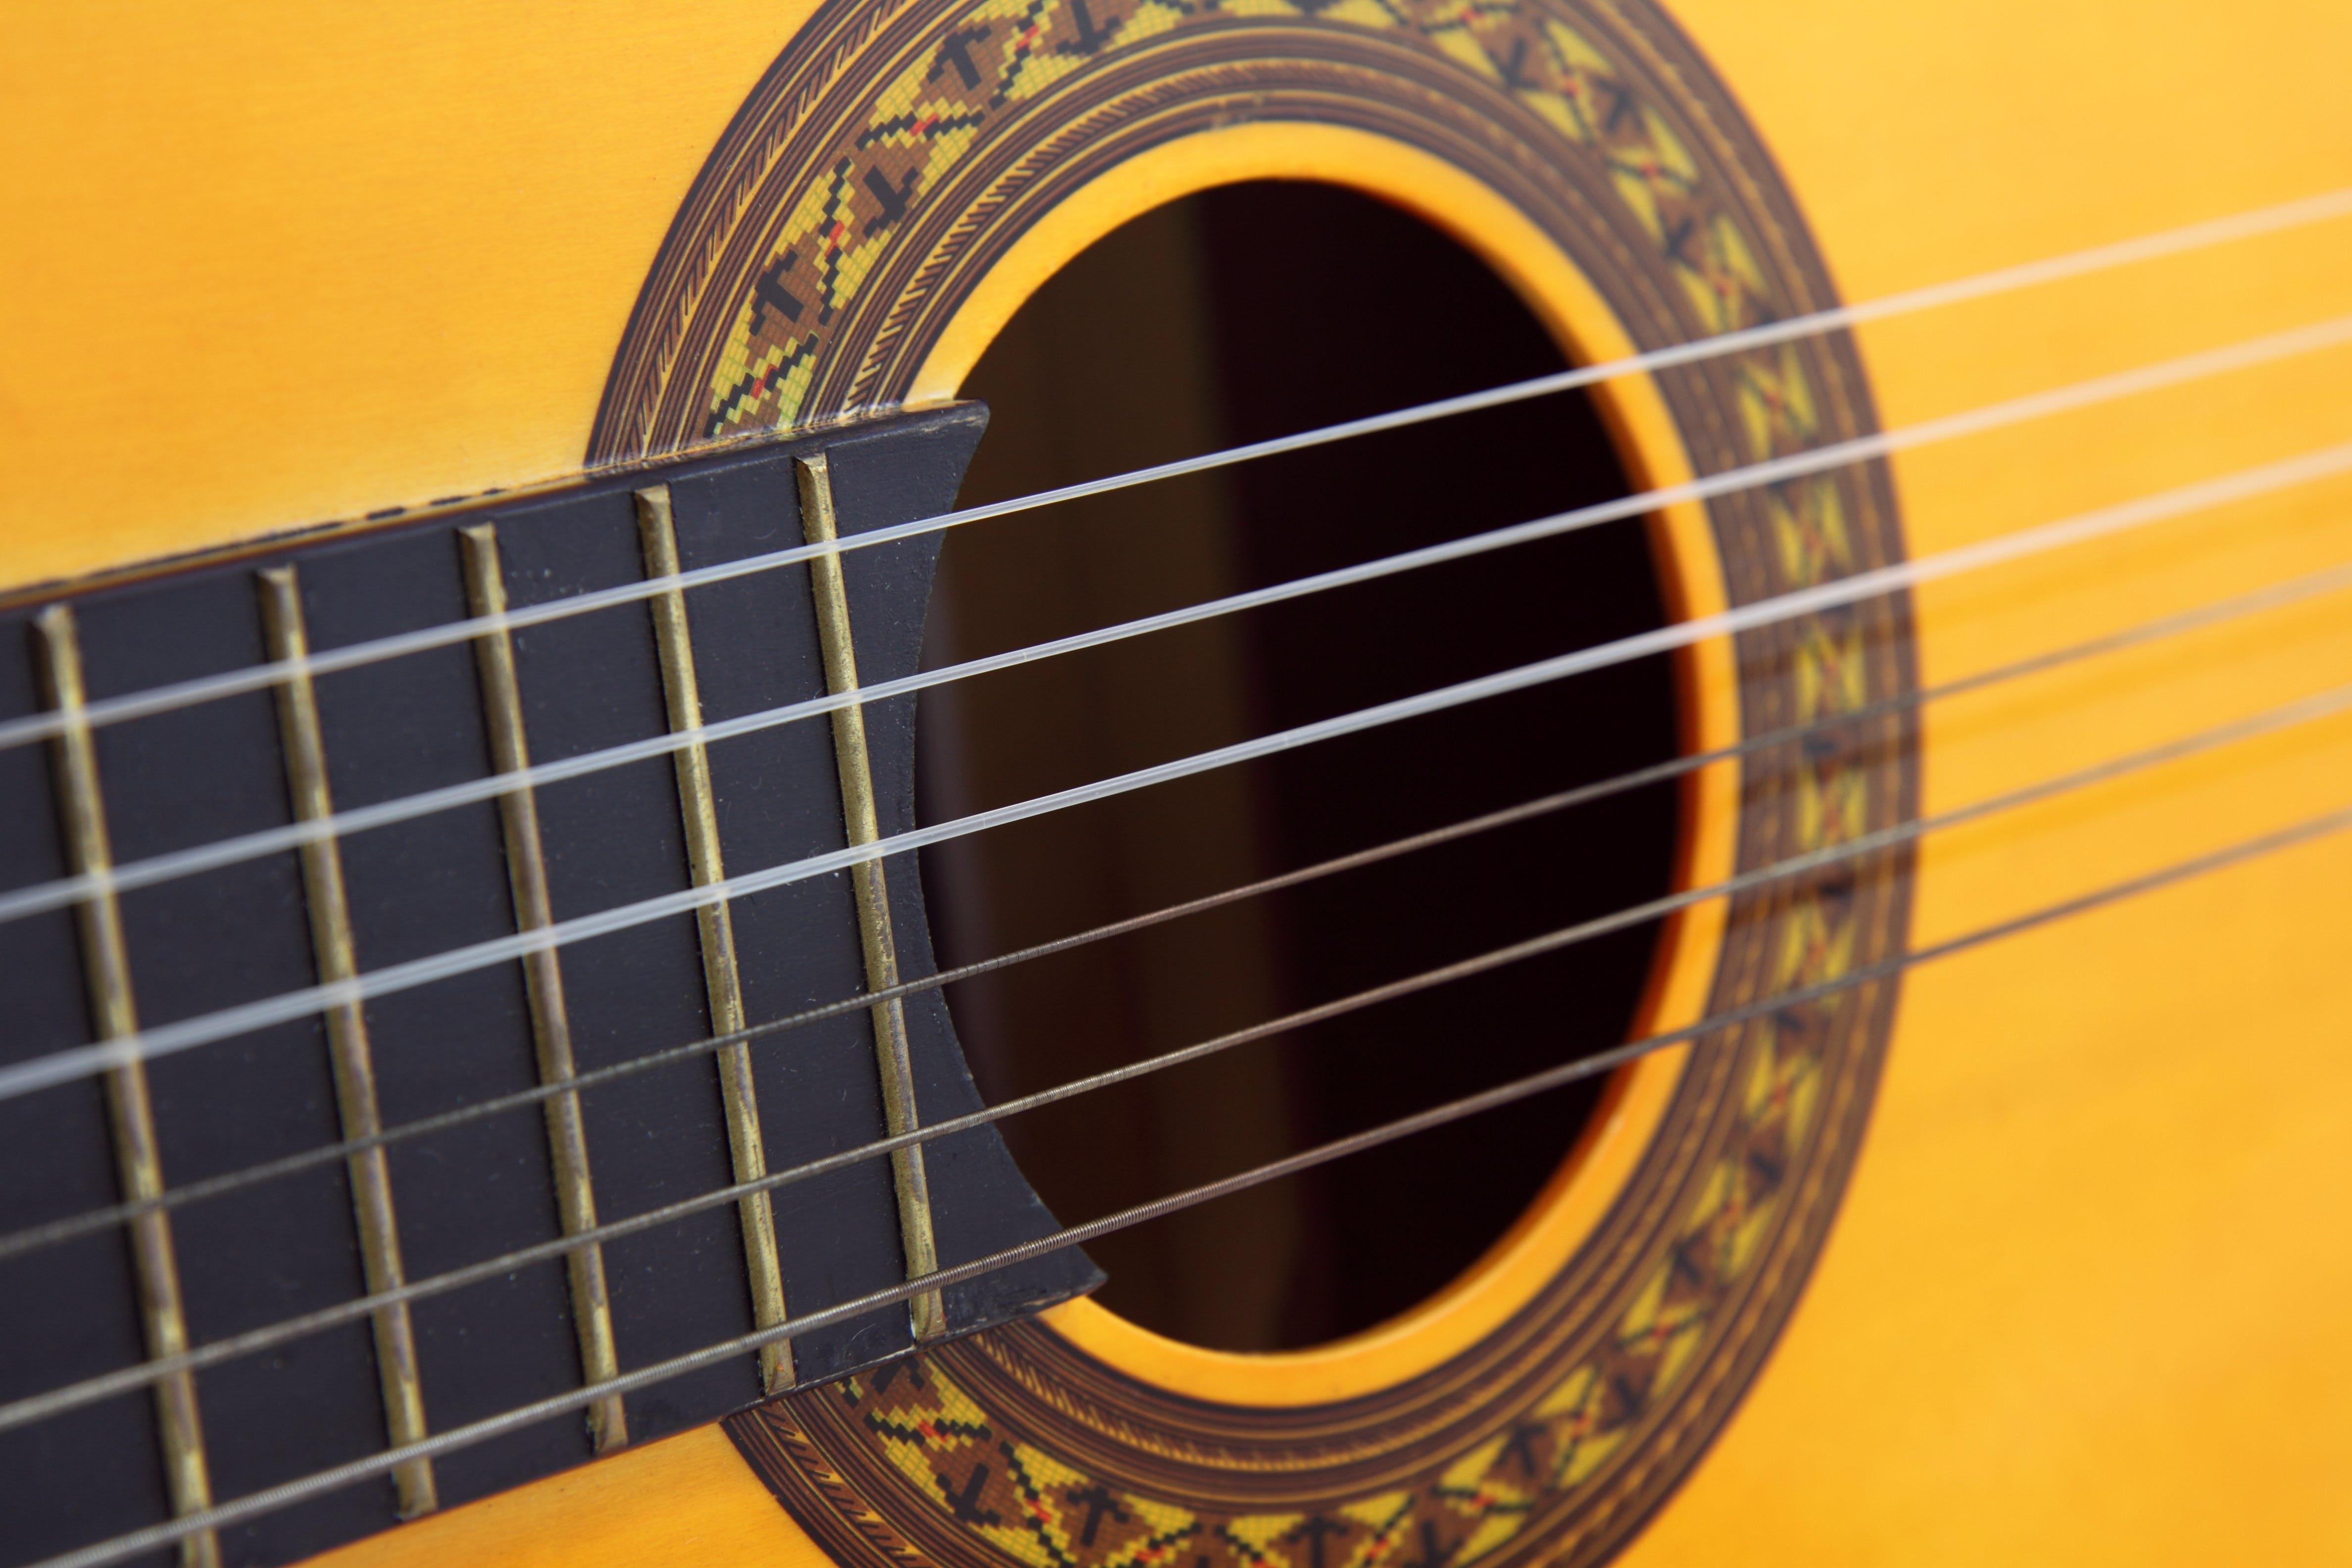 Free stock photo of wood, yellow, music, musician